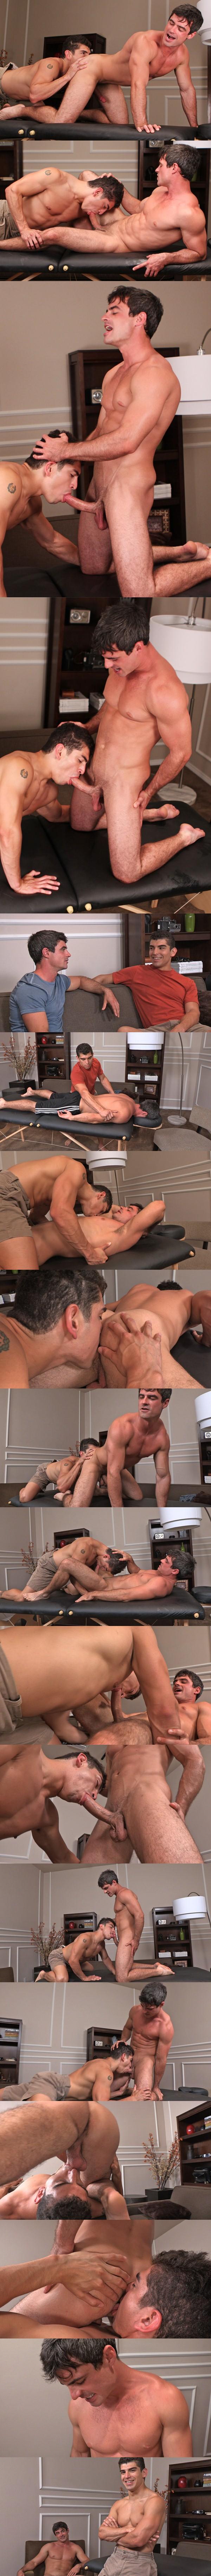 Jessie rims and blows Daniel at Seancody 02